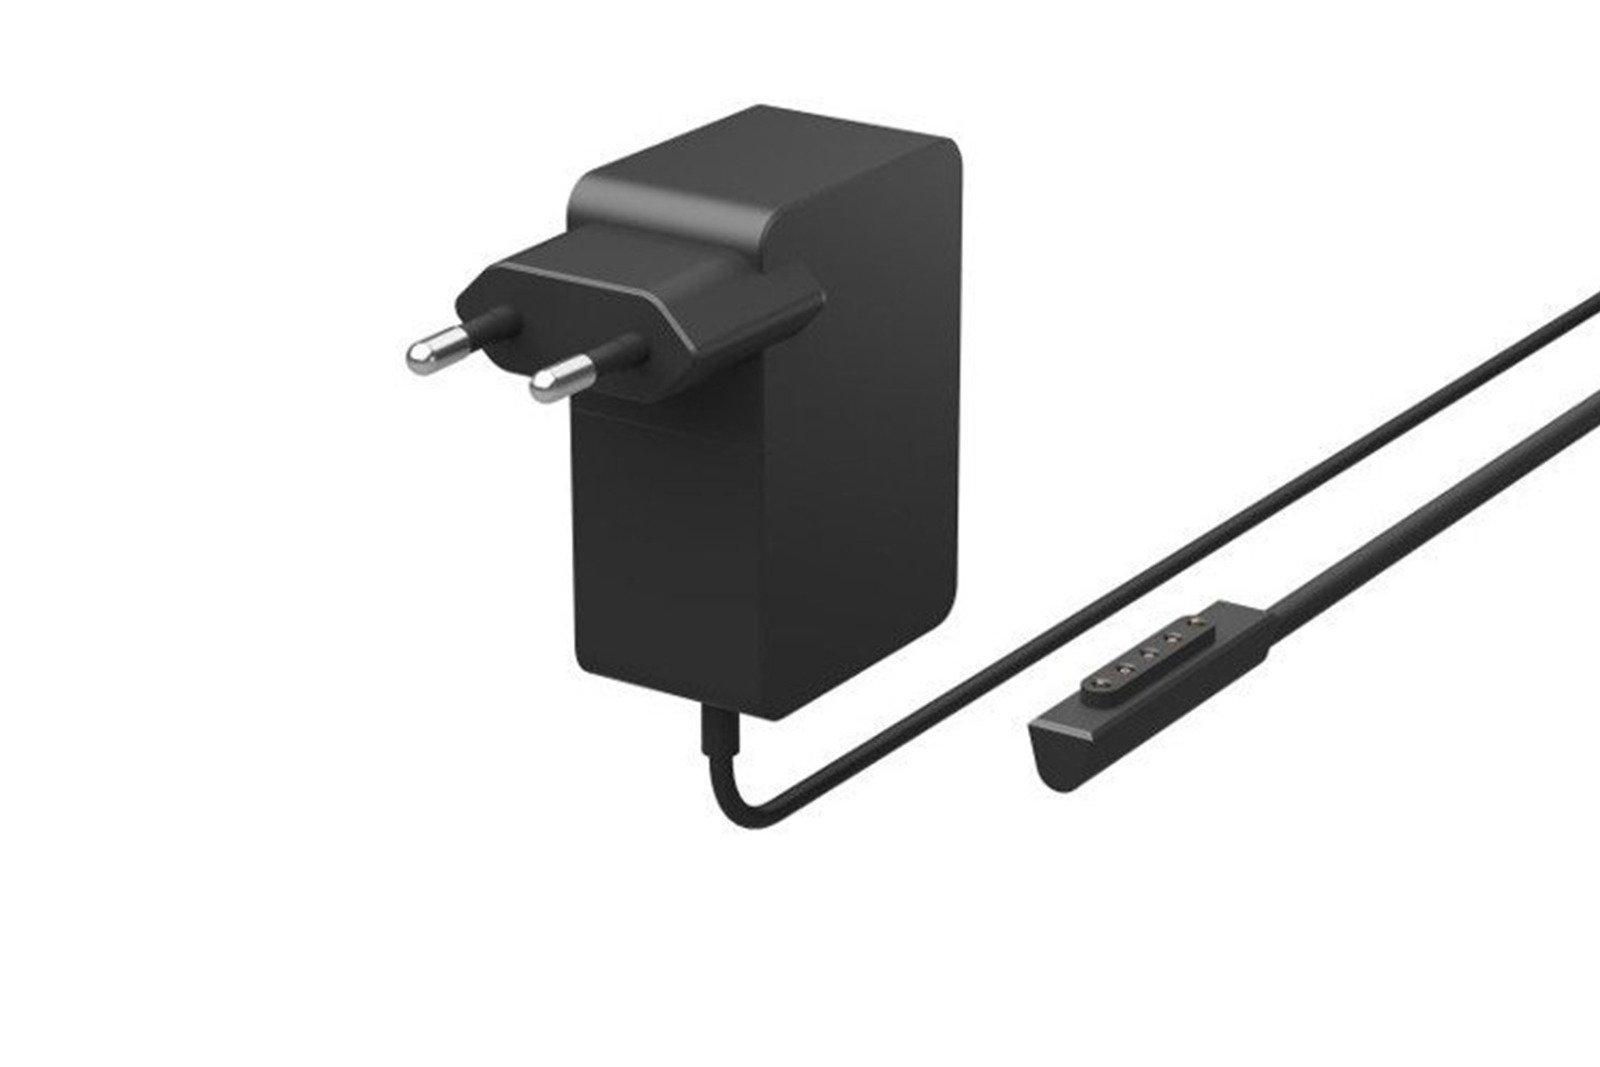 New Original Microsoft Surface RT Pro 2 24W Power Supply Q6T-00008